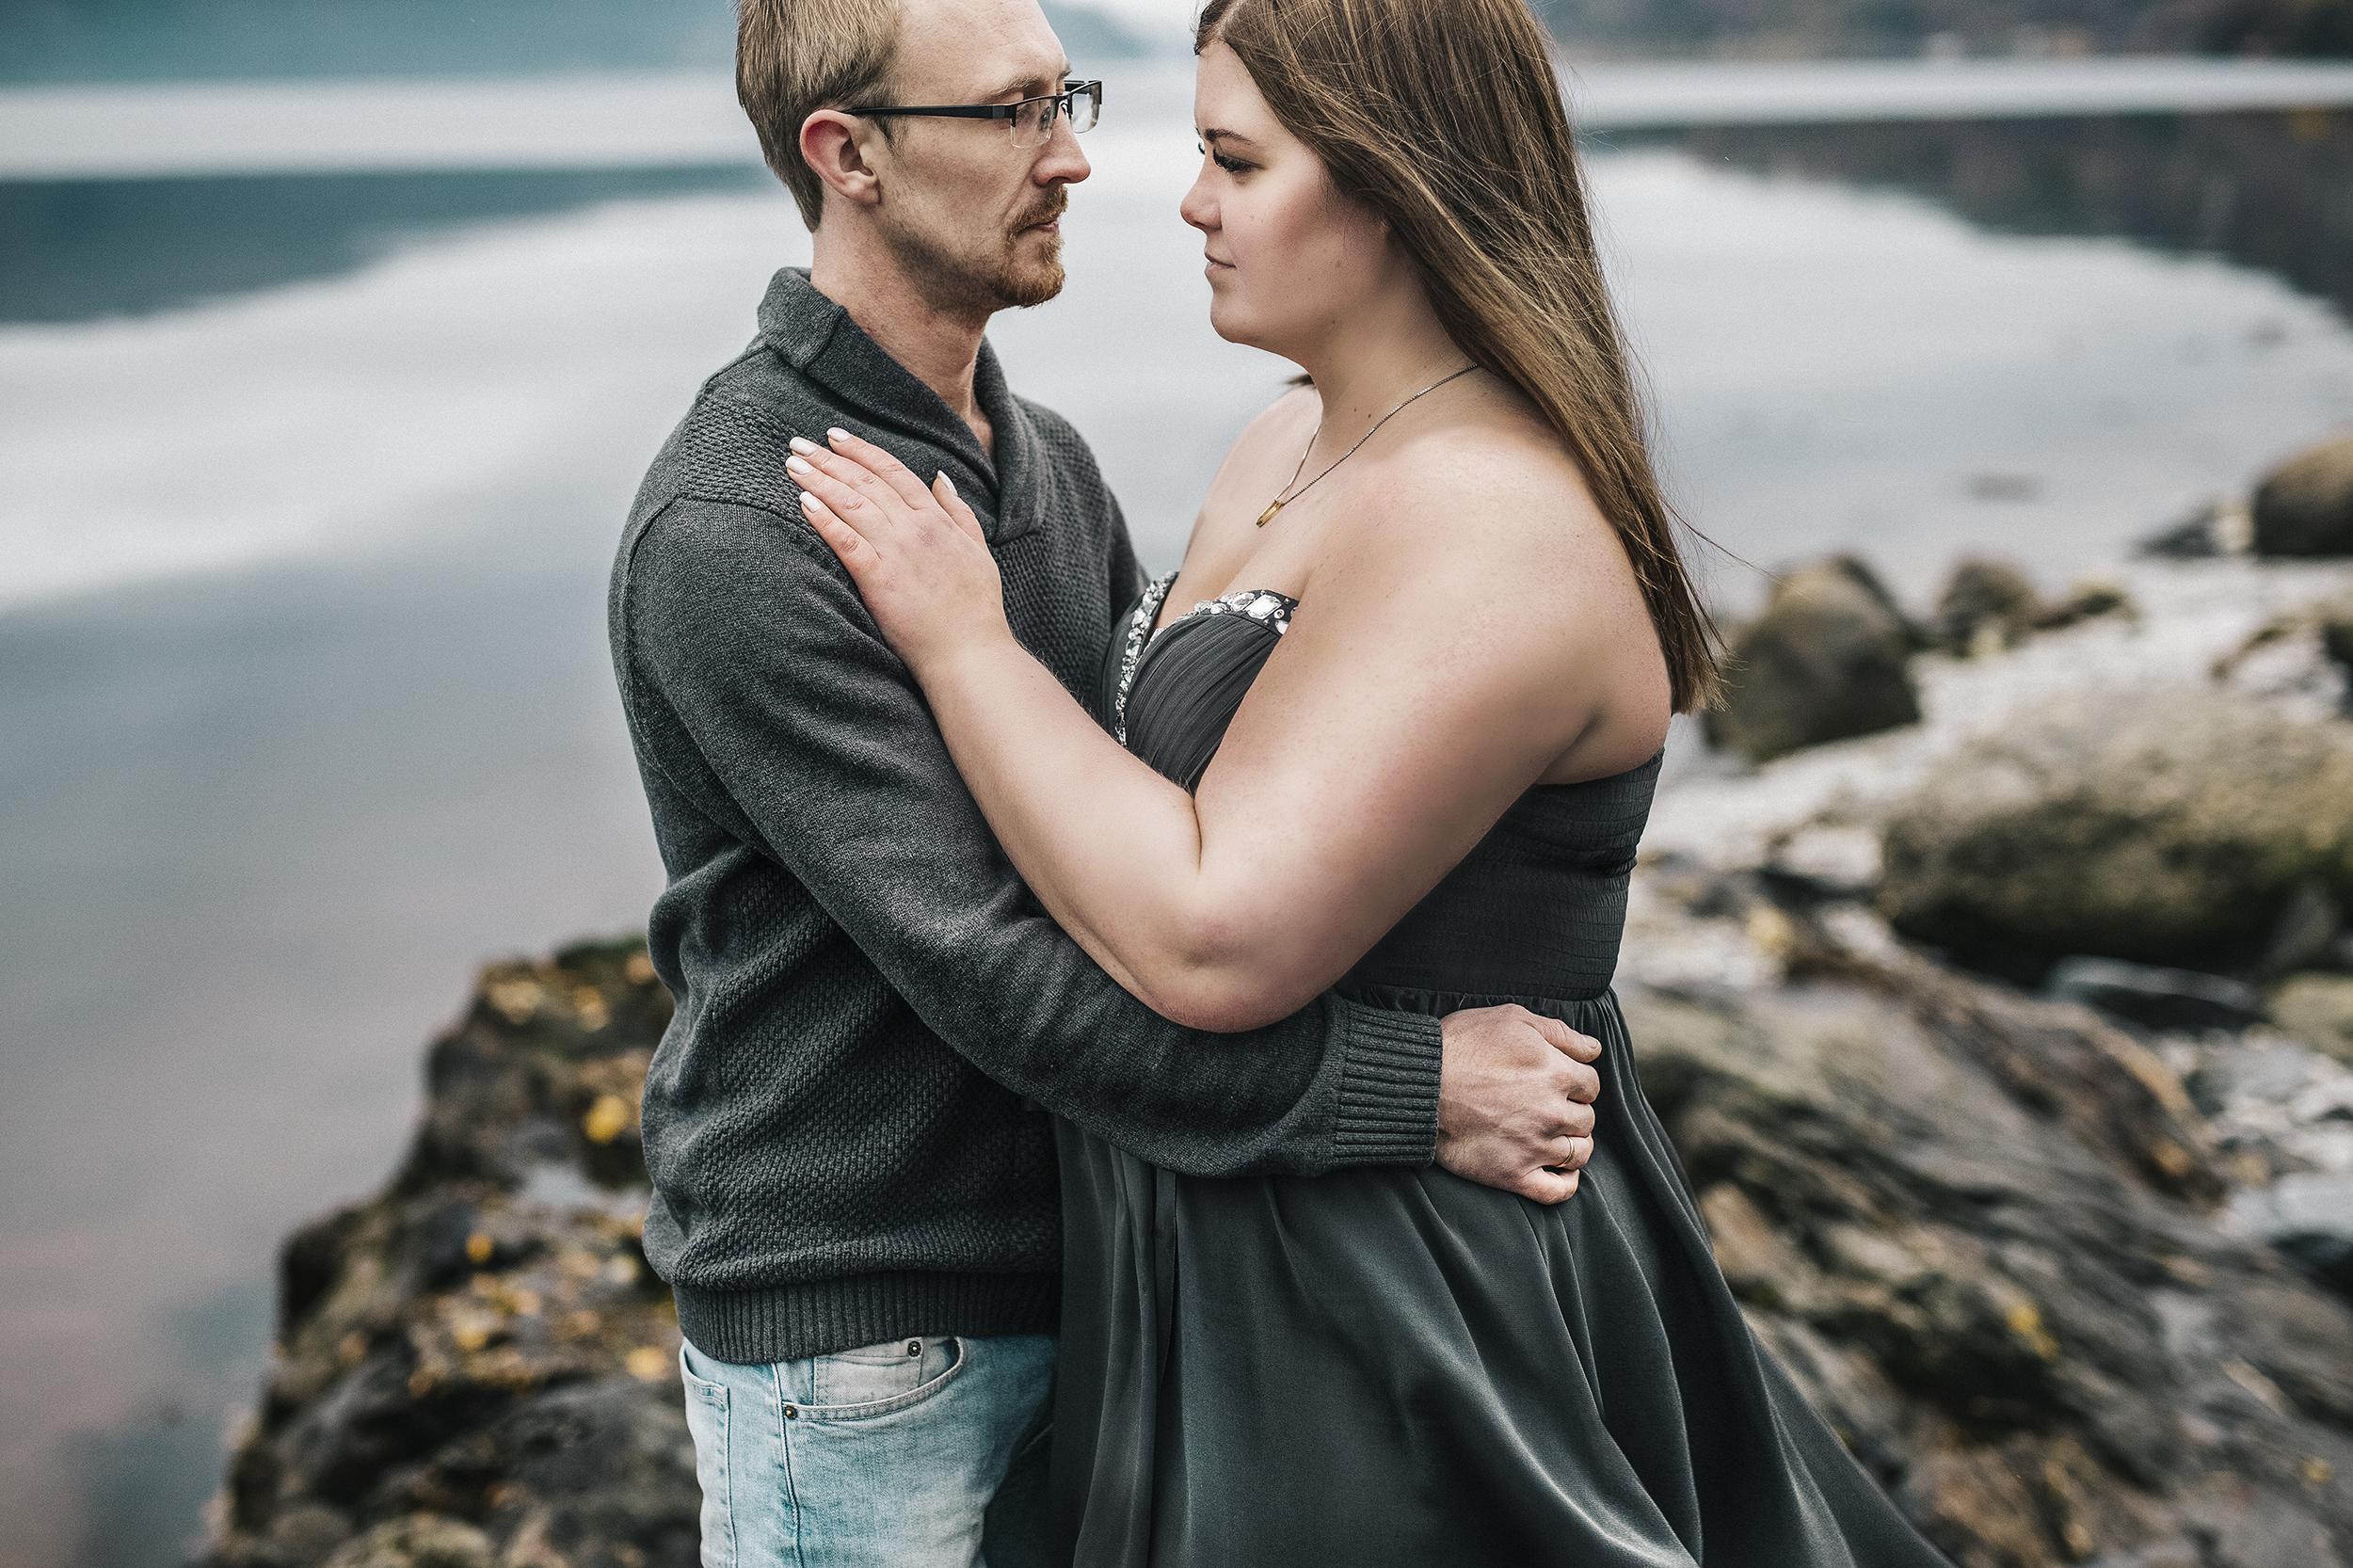 fotograf kjæreste bryllup forlovelse par møre og romsdal